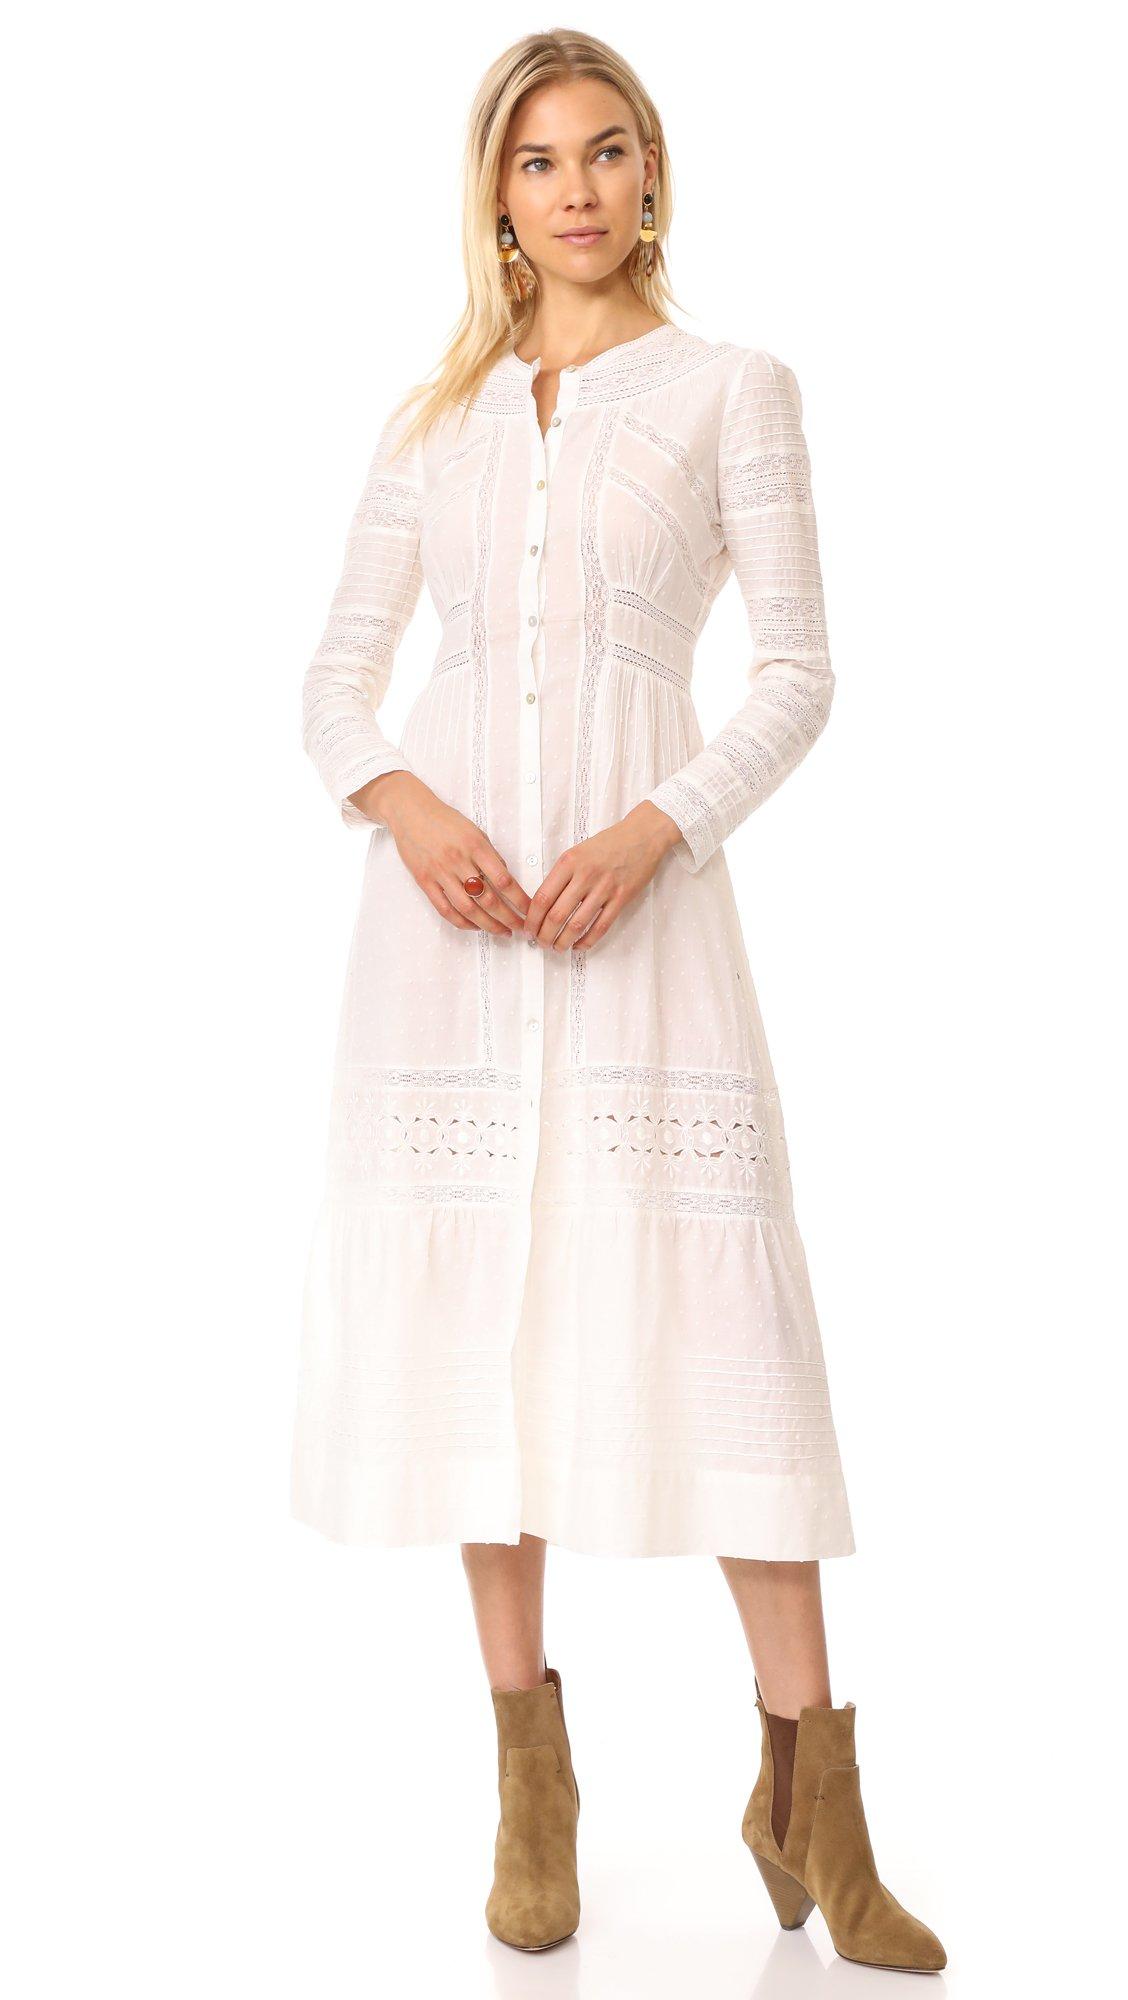 LOVESHACKFANCY Women's Victorian Maxi Dress, Ivory, 8